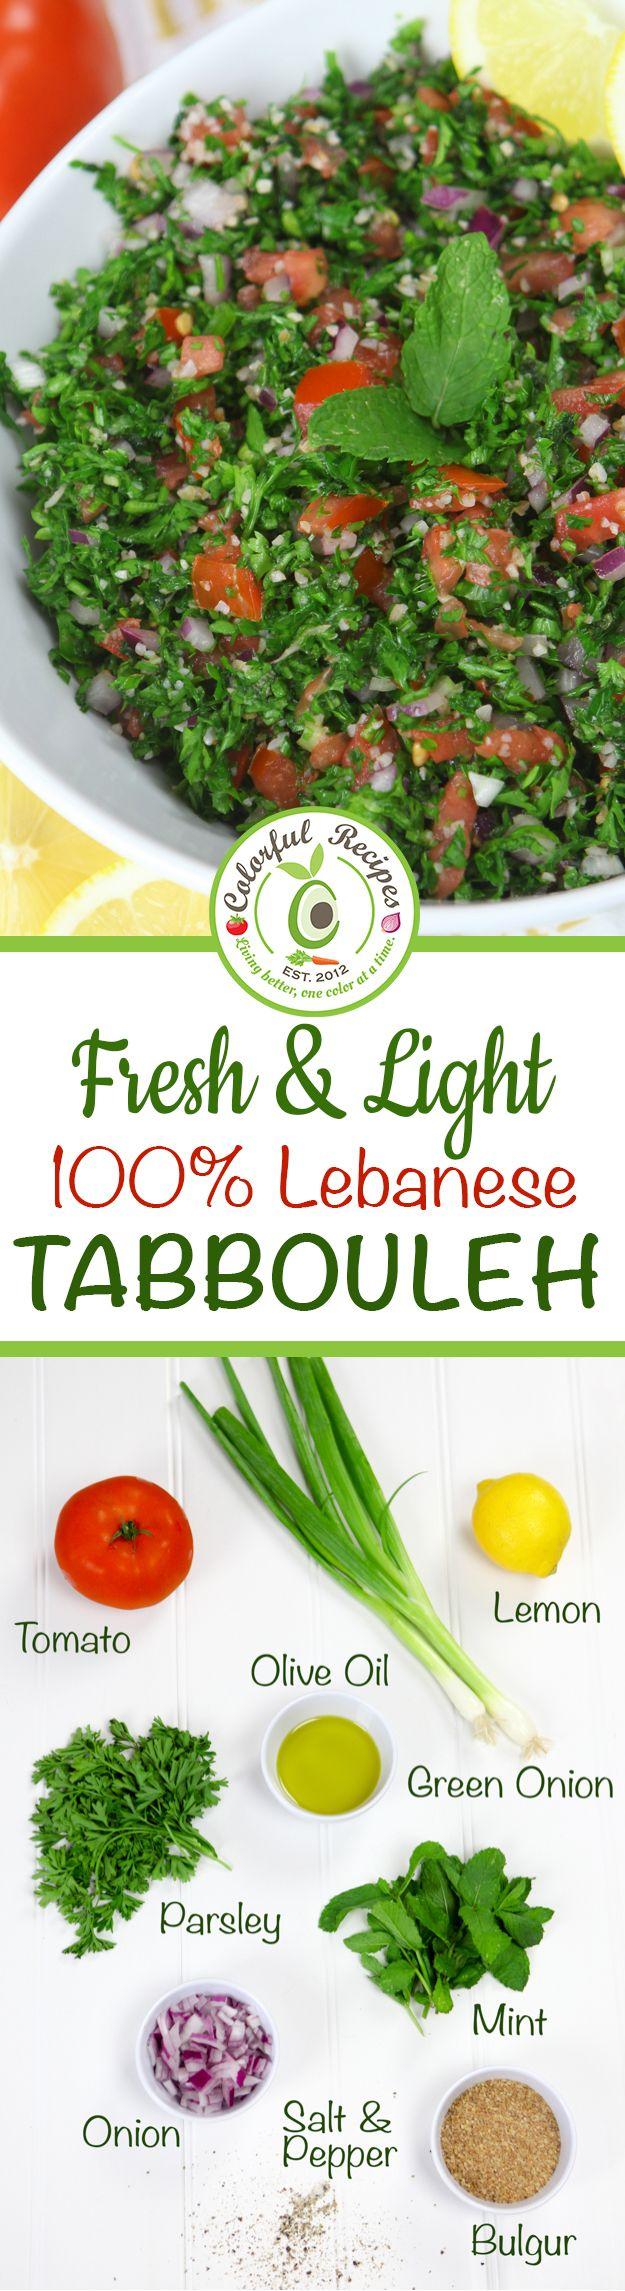 Lebanese salad recipes parsley